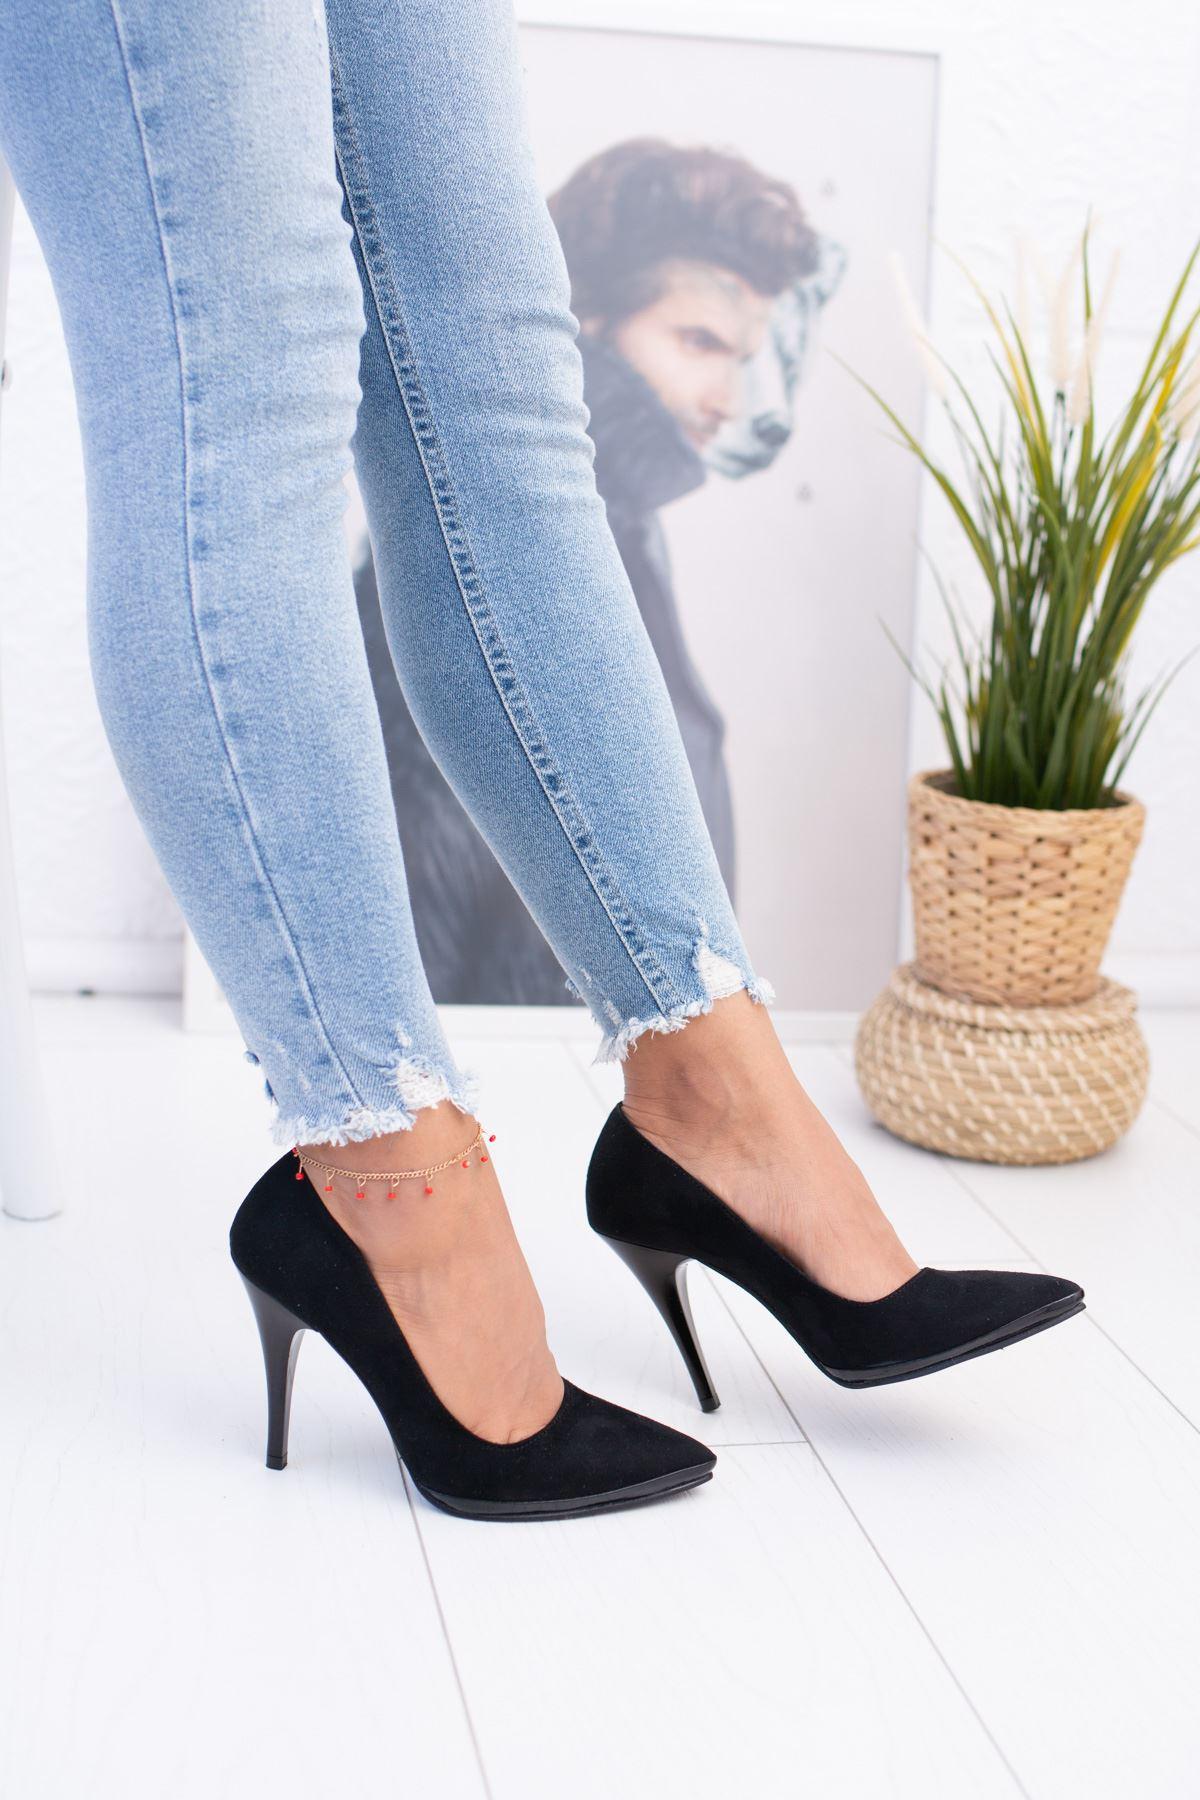 Sivri Burun Çivi Topuk Siyah Süet Ayakkabı